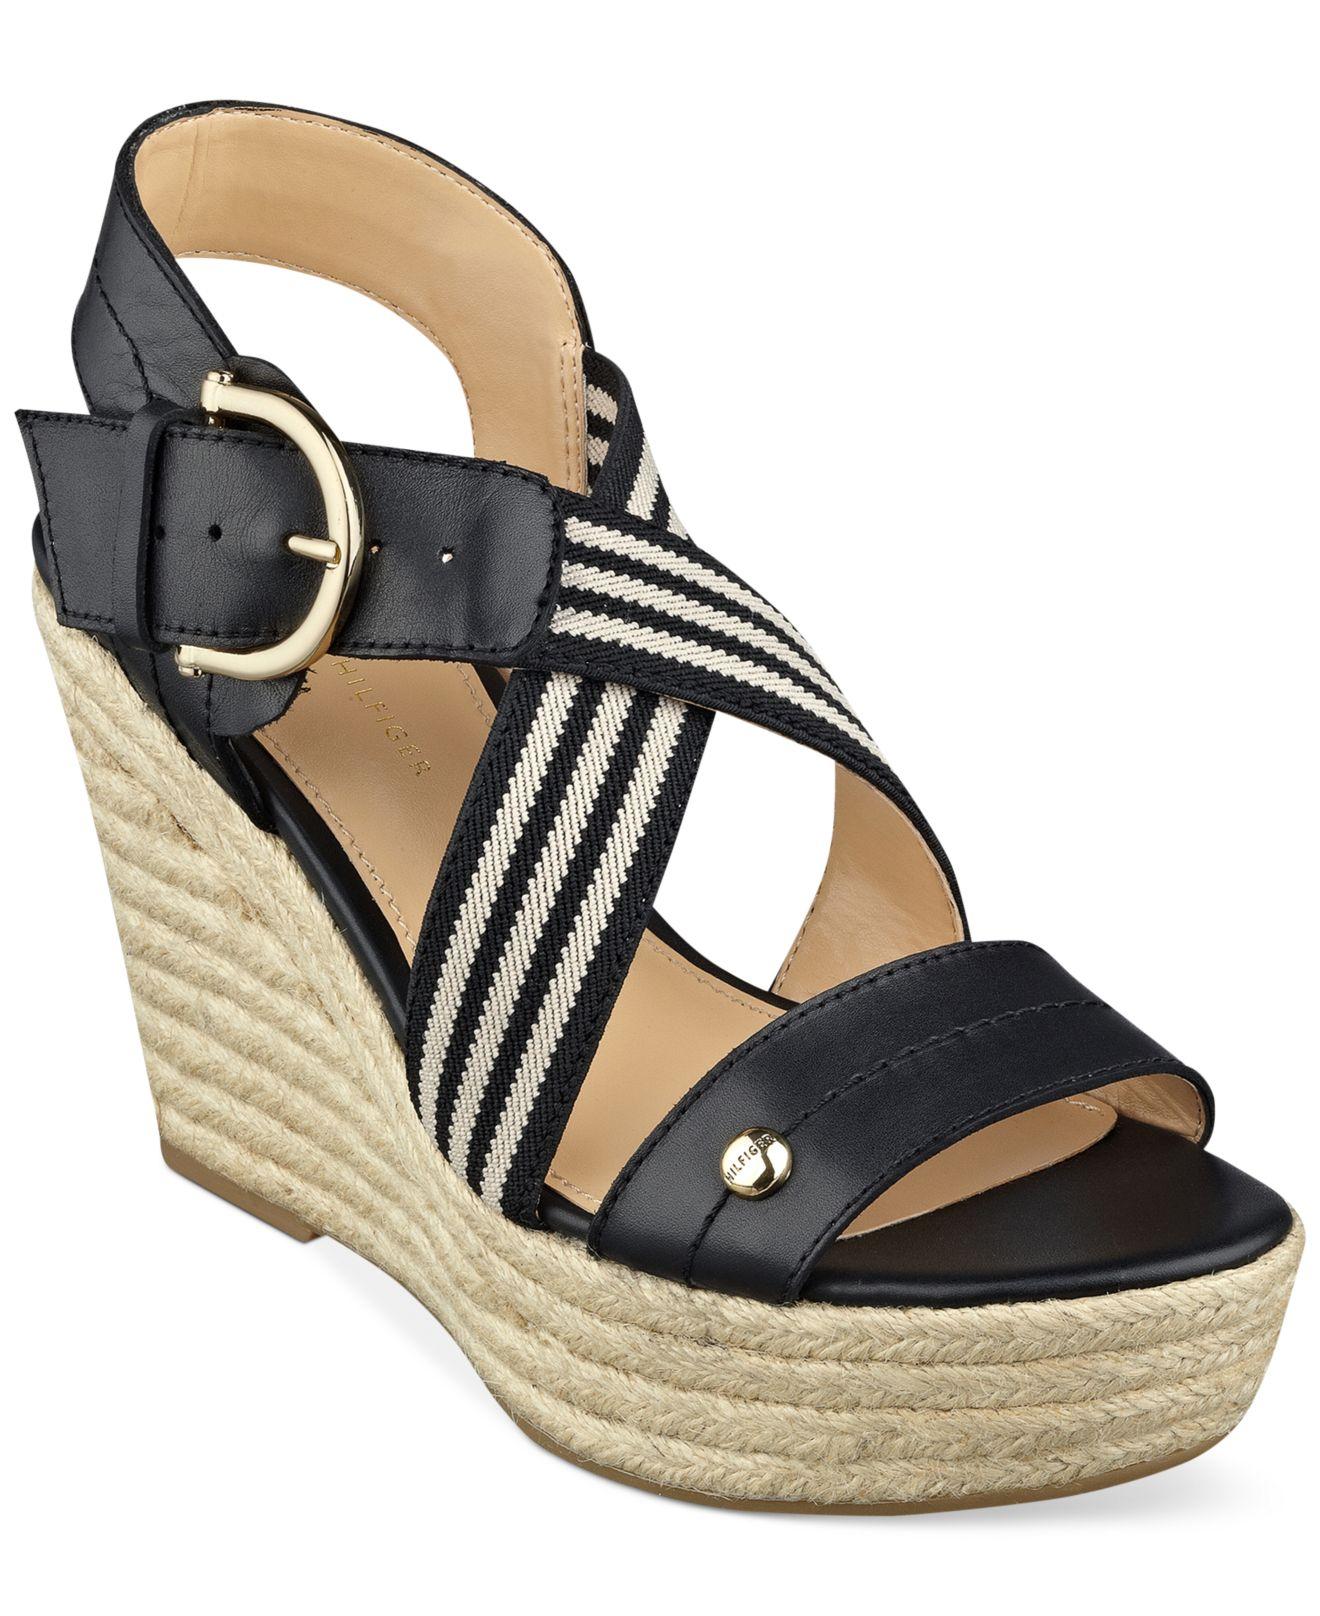 5e16955e38d Lyst - Tommy Hilfiger Women s Ignacia Platform Wedge Sandals in Black